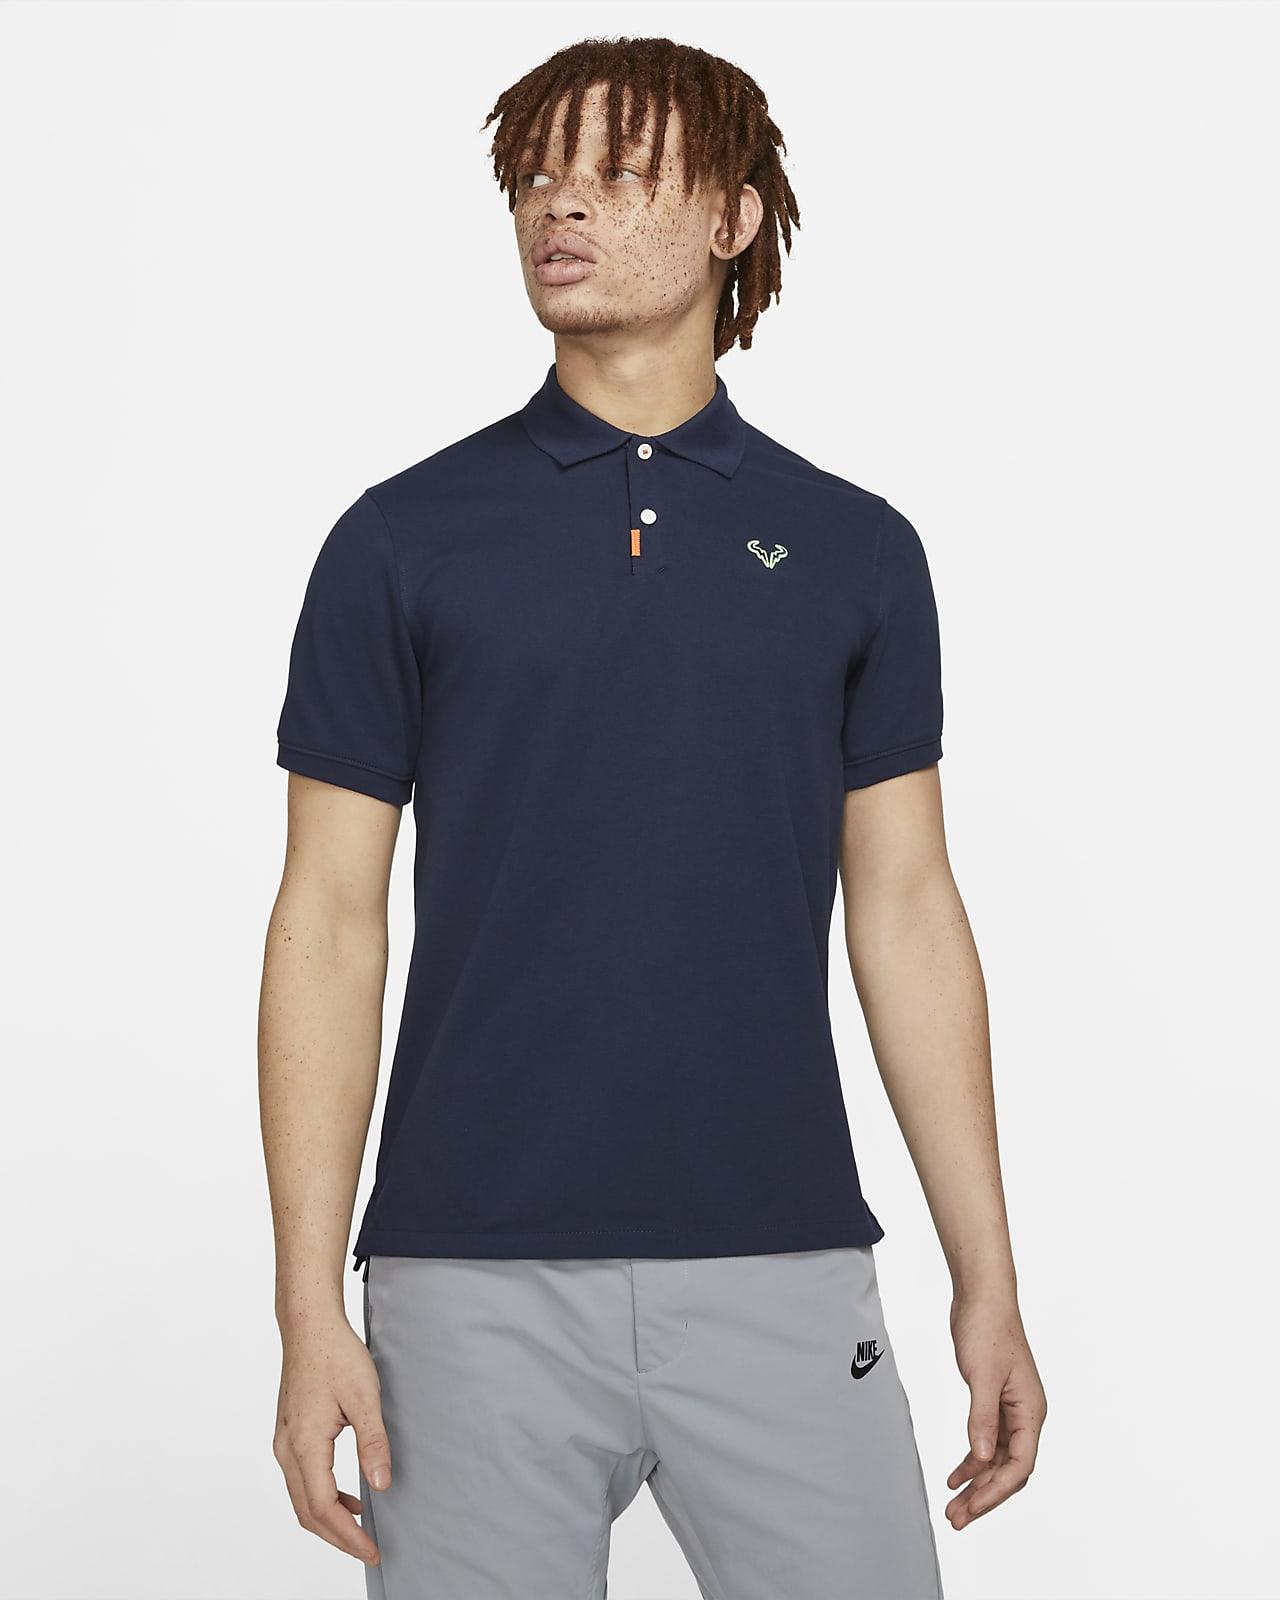 Polo de ajuste slim para hombre The Nike Polo Rafa